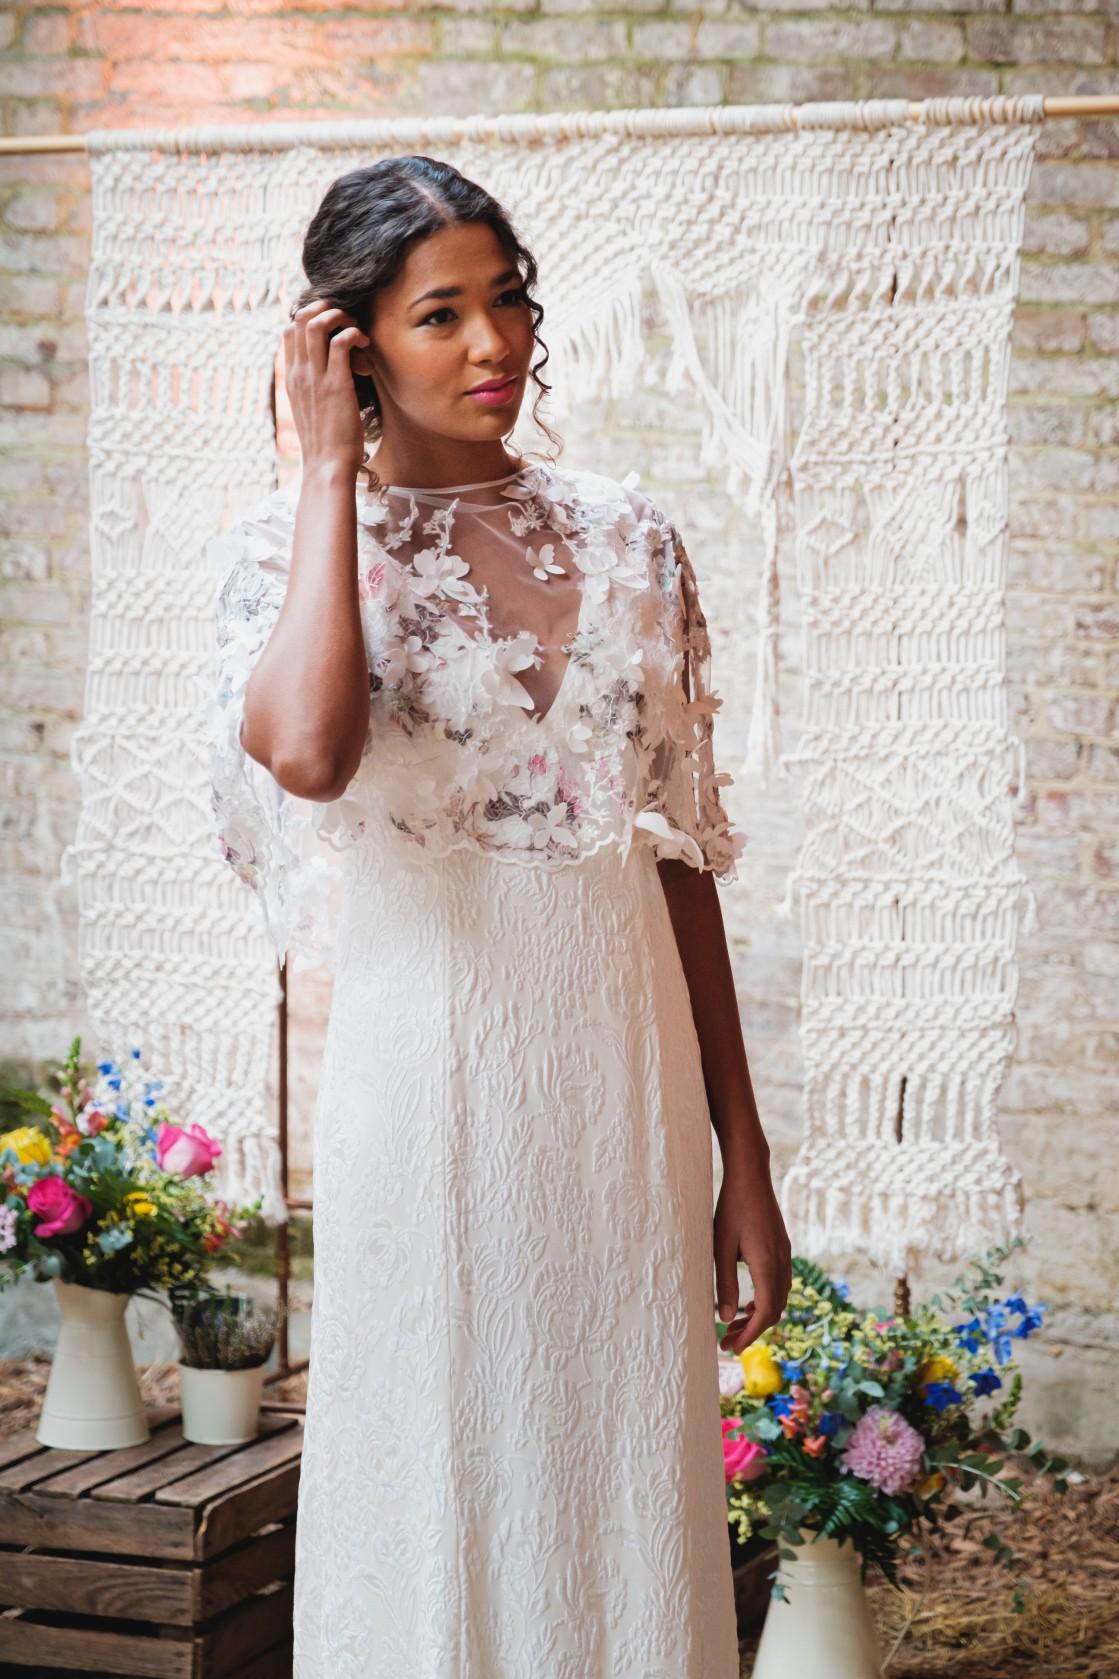 colourful micro wedding at patricks barn - wedding macrame - colourful wedding flowers - bohemian wedding dress